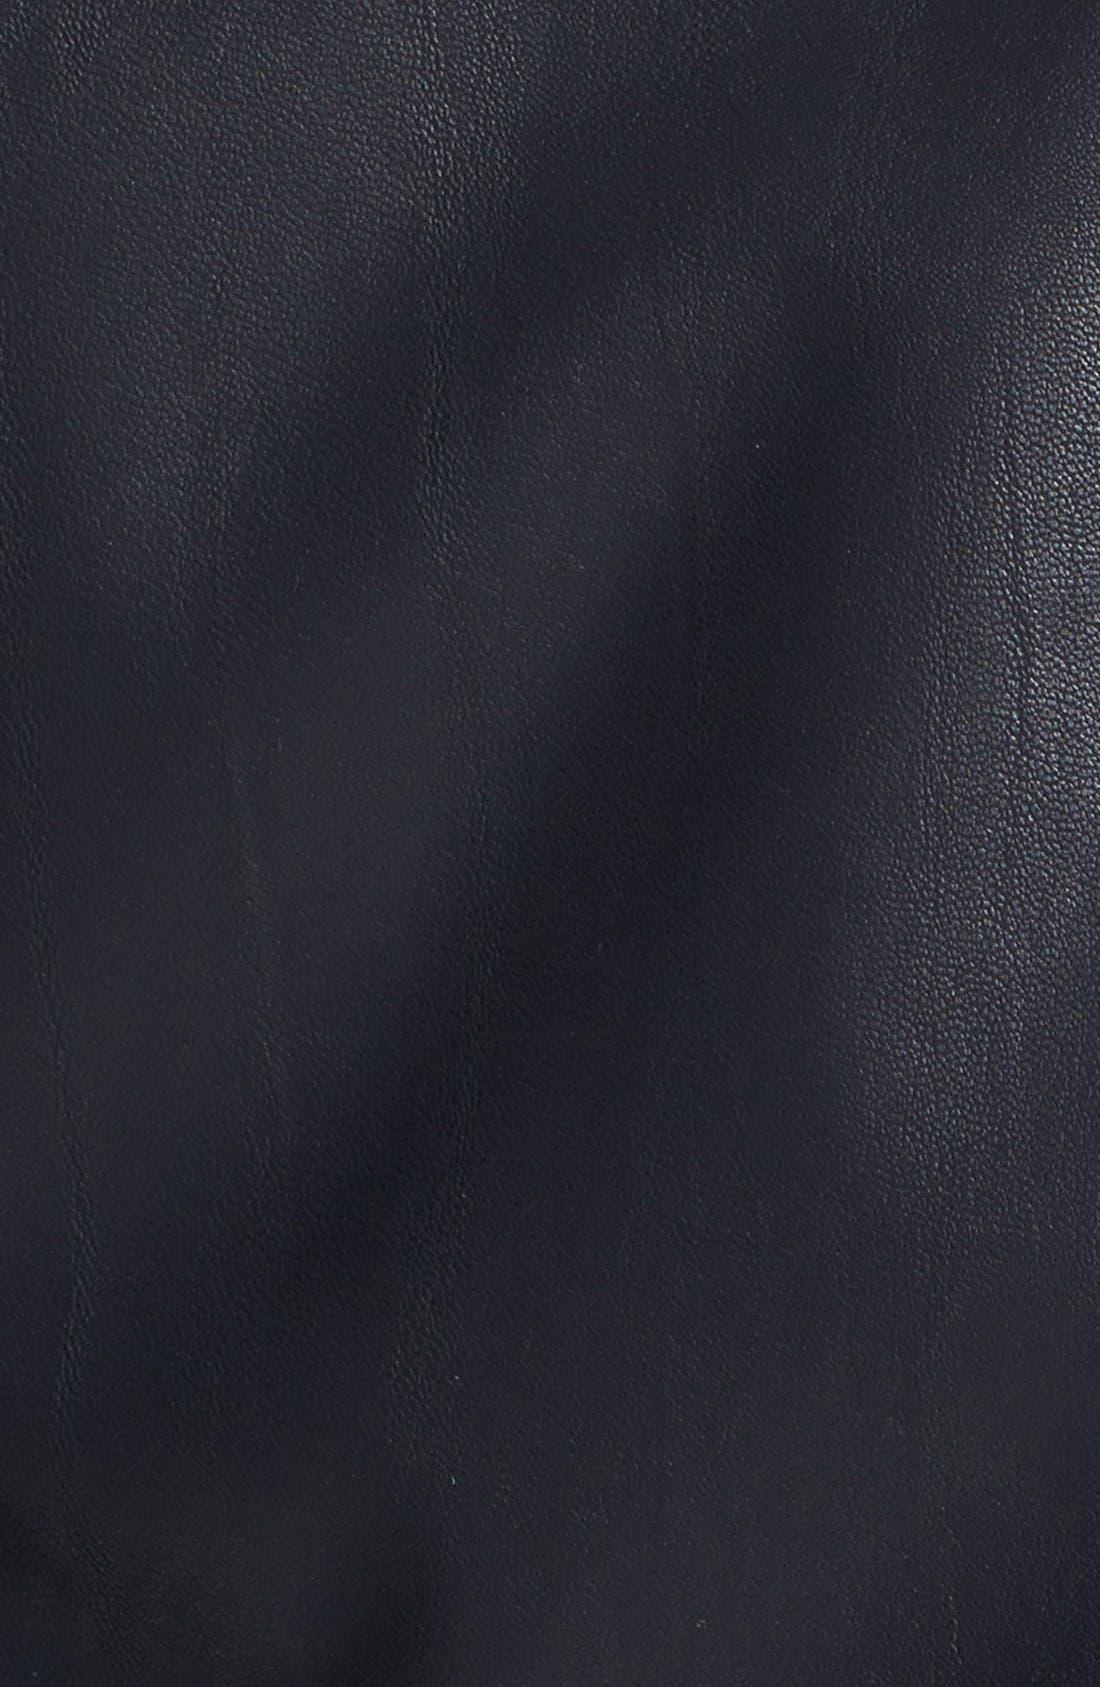 Alternate Image 3  - Topshop 'Wylde' Faux Leather Biker Jacket